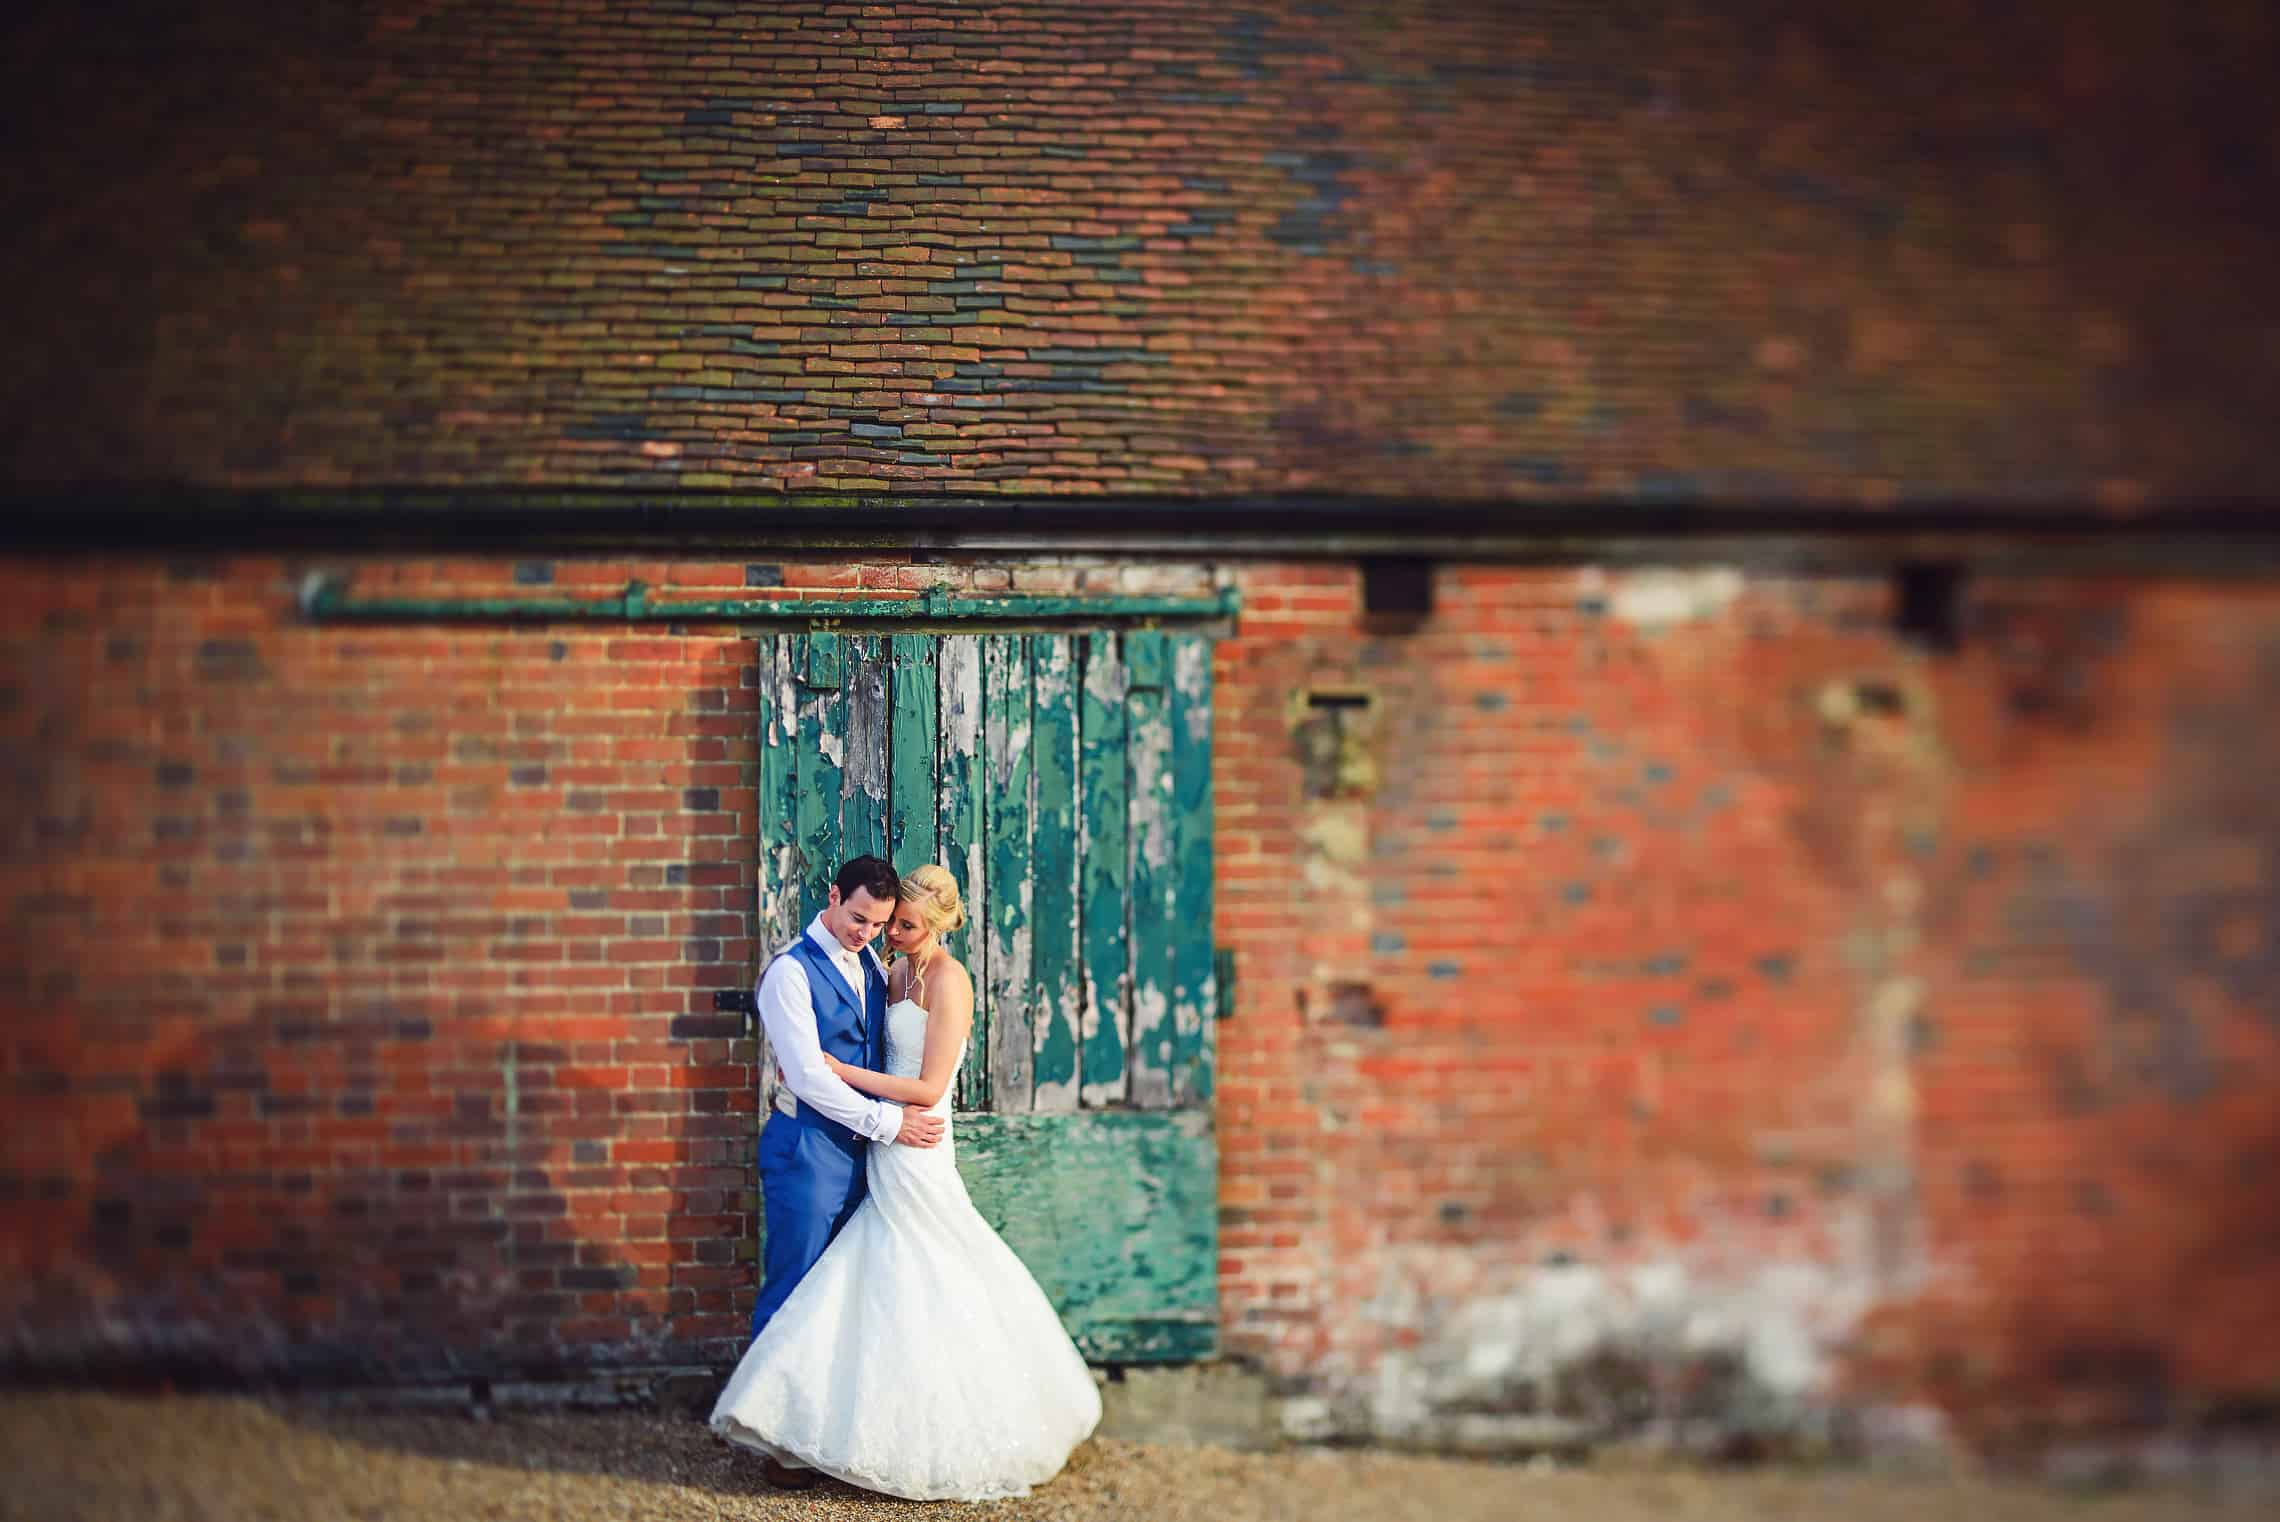 gaynes_park_wedding_lm_justin_bailey_photography_017